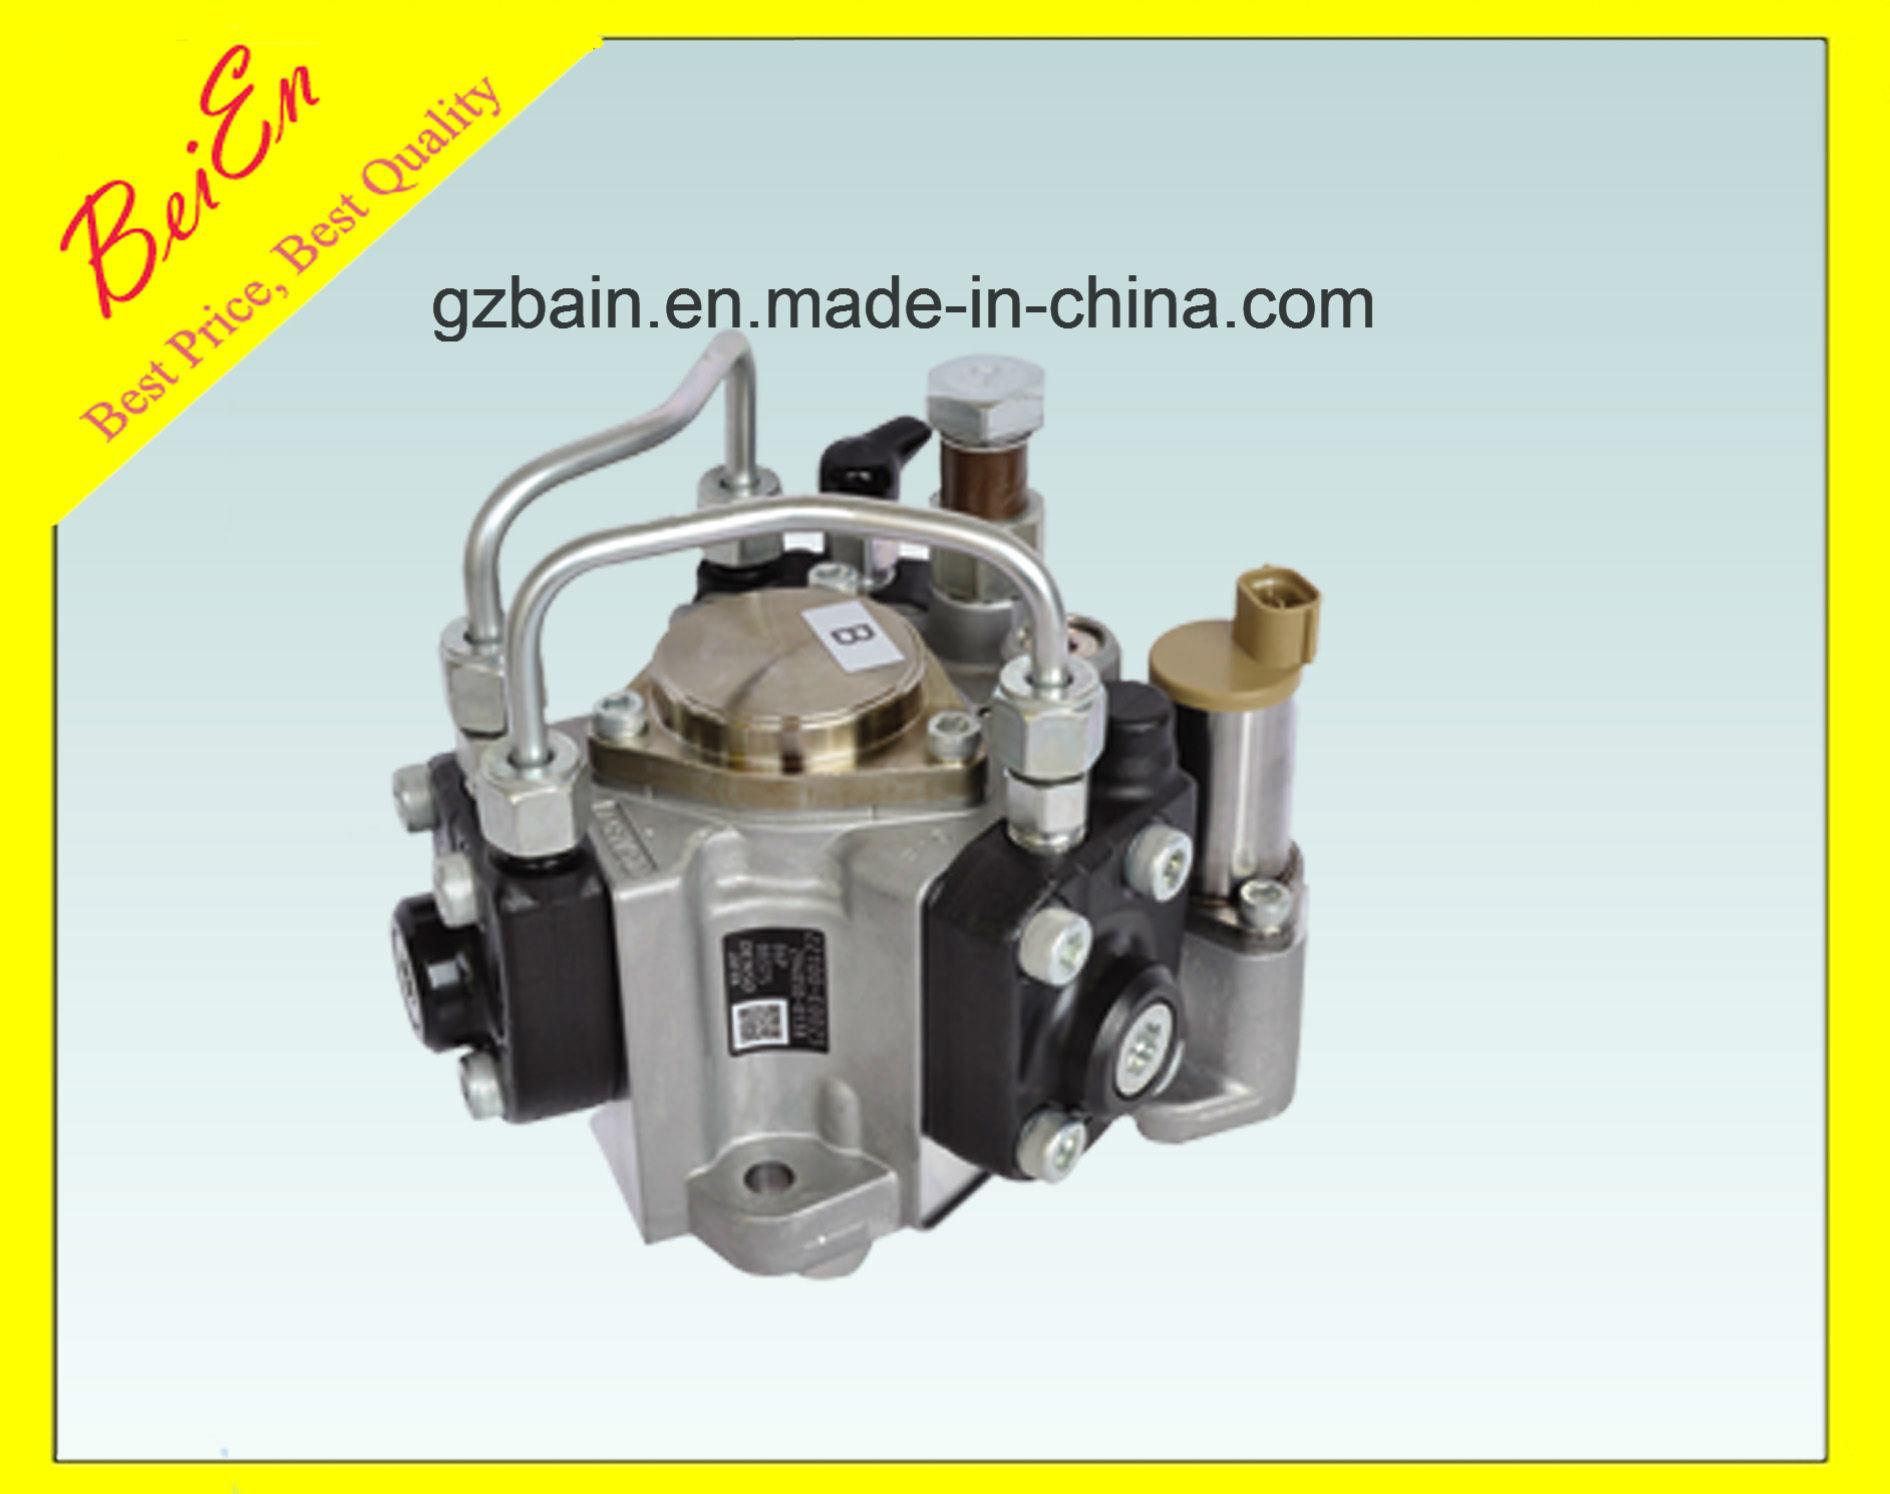 Original Fuel Injection Pump for Hino Excavator Engine J05e 294000-0618